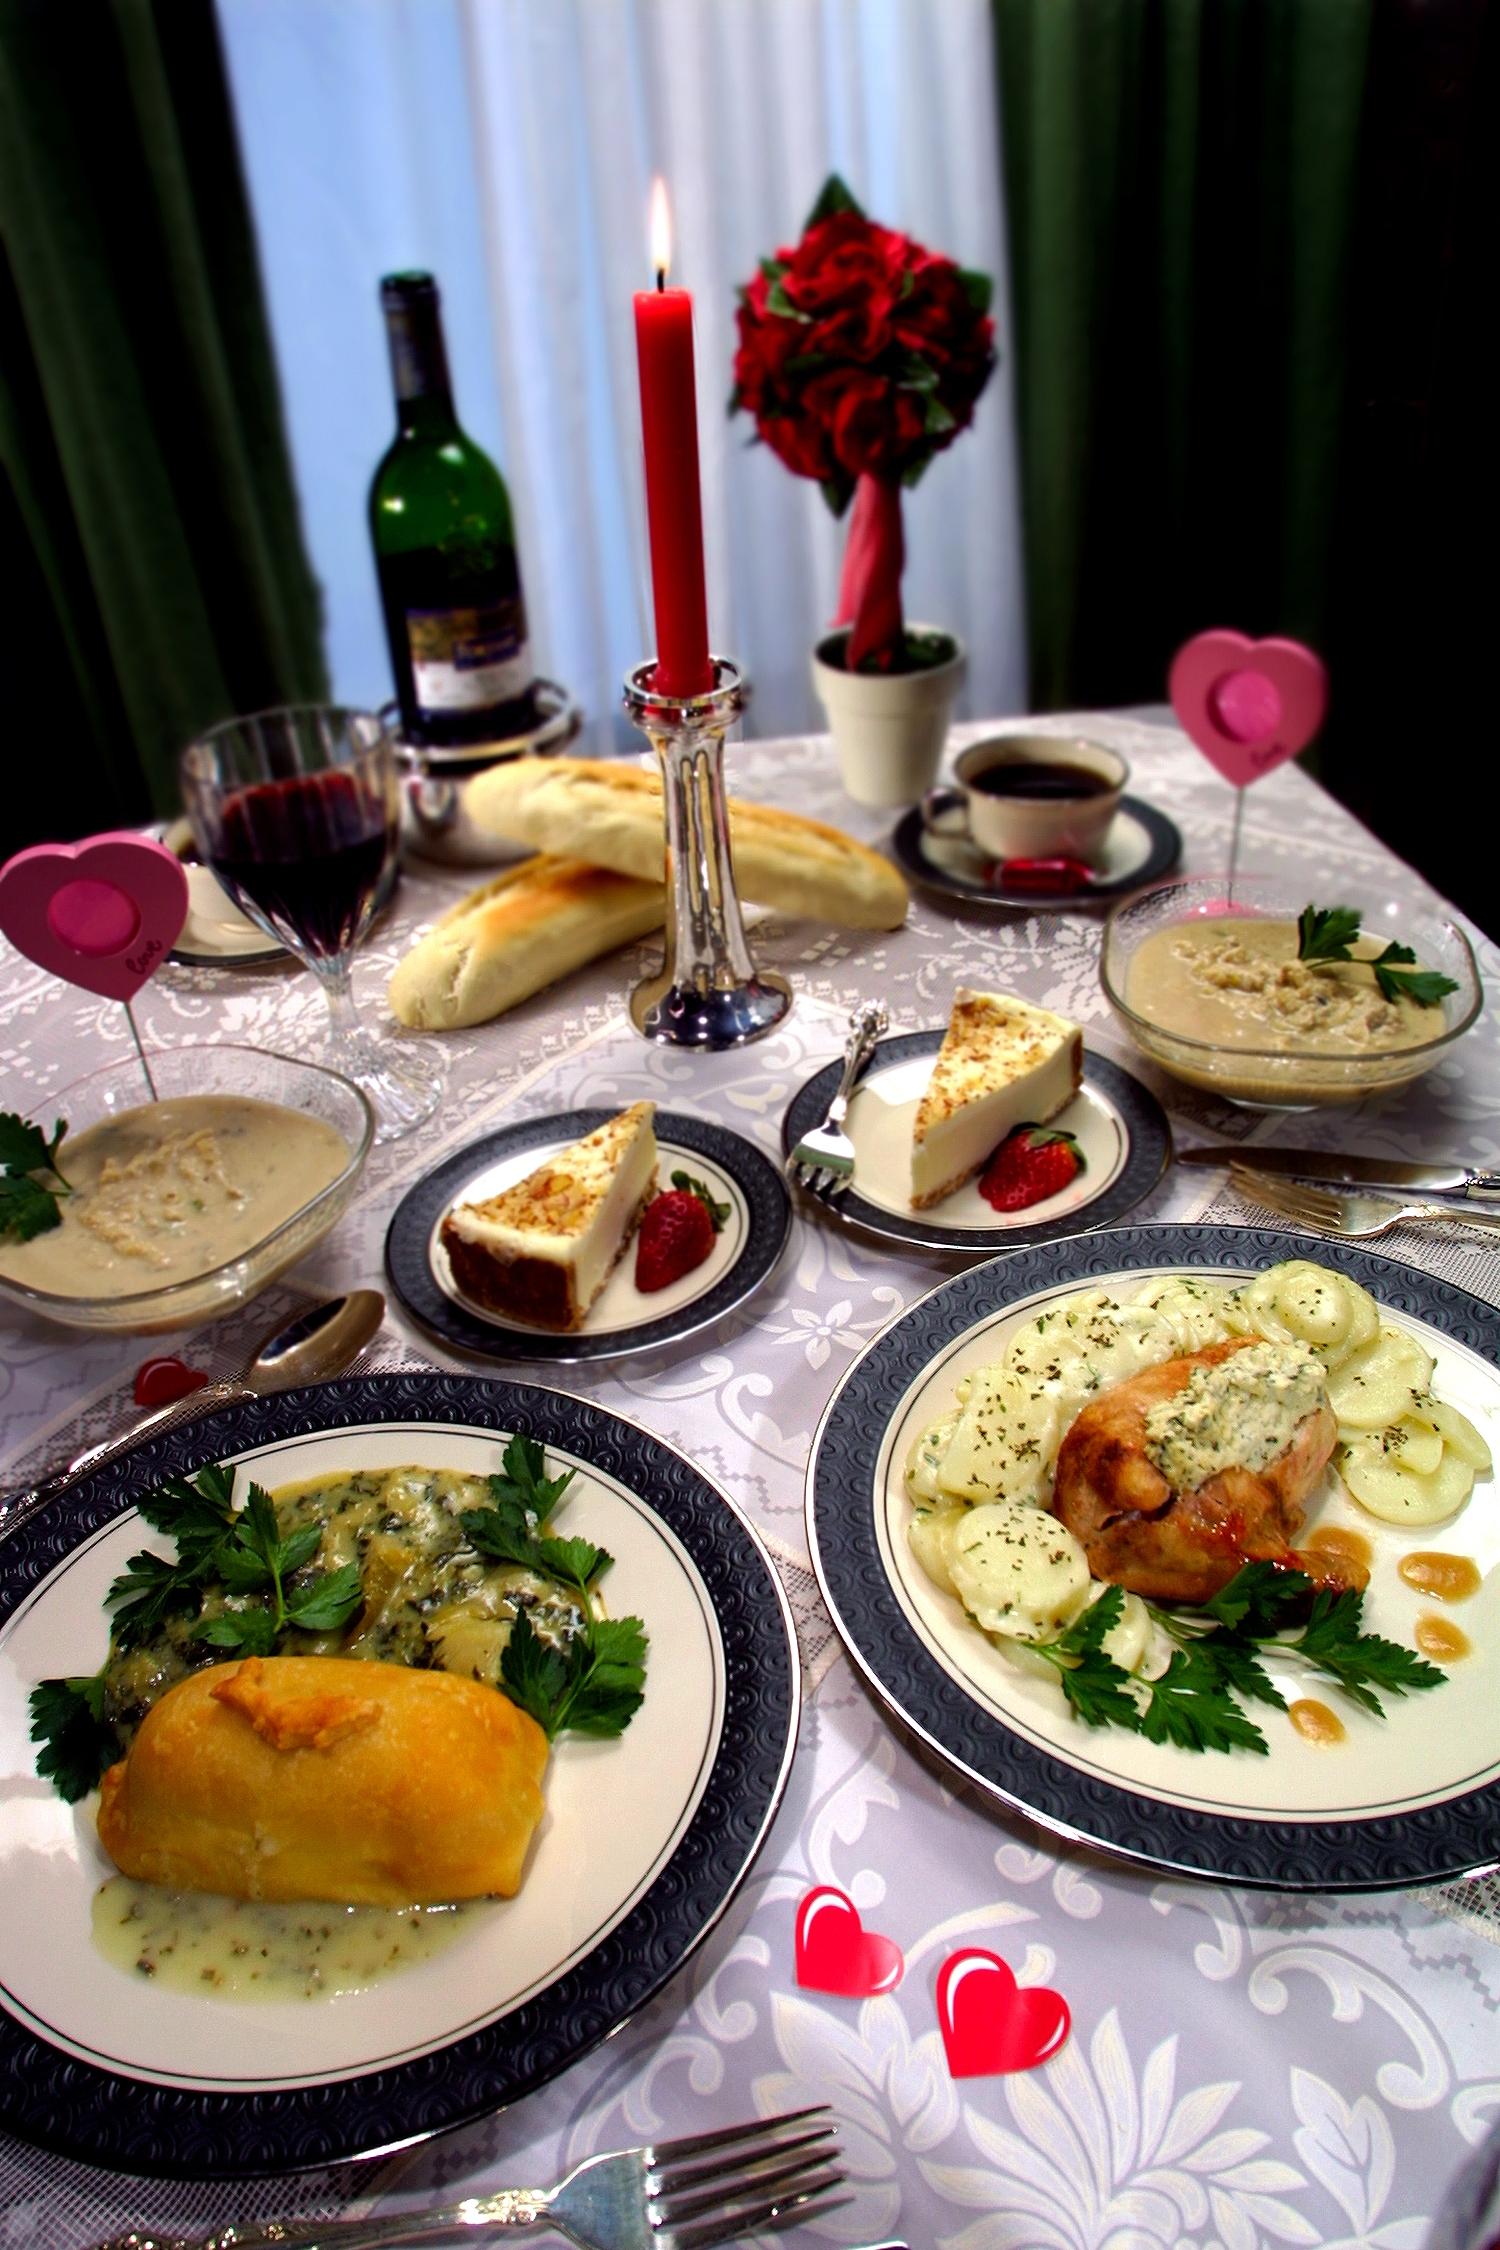 GourmetStation Provider Of Upscale Gourmet Dinners